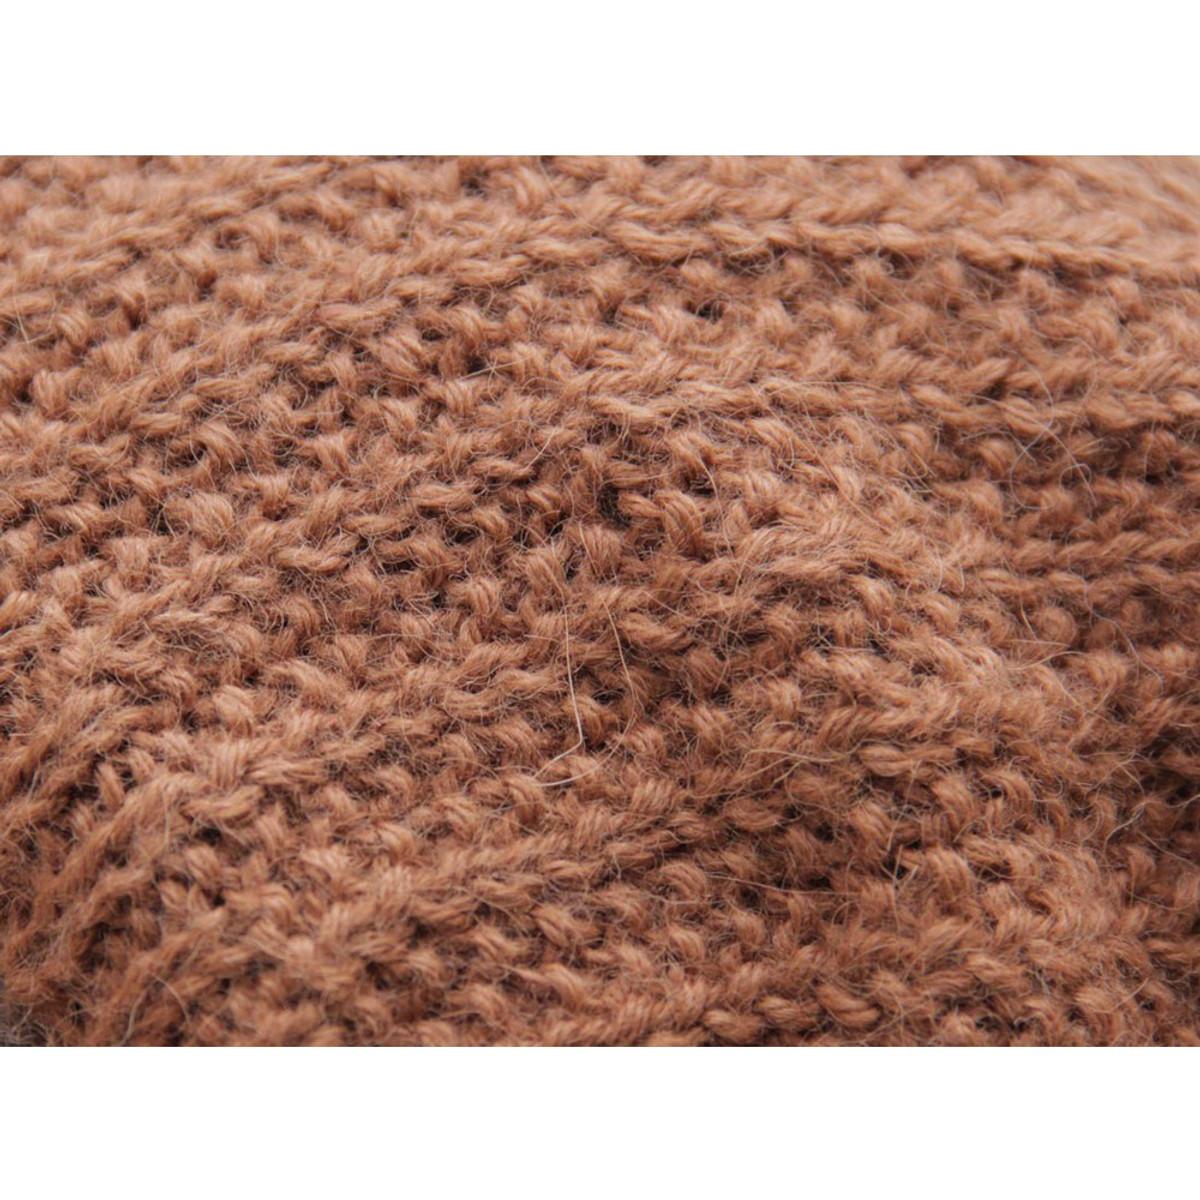 abba76ac Superfine Hand Knitted Alpaca Wool Beanie Hat & Scarf Copper (33C-016-790